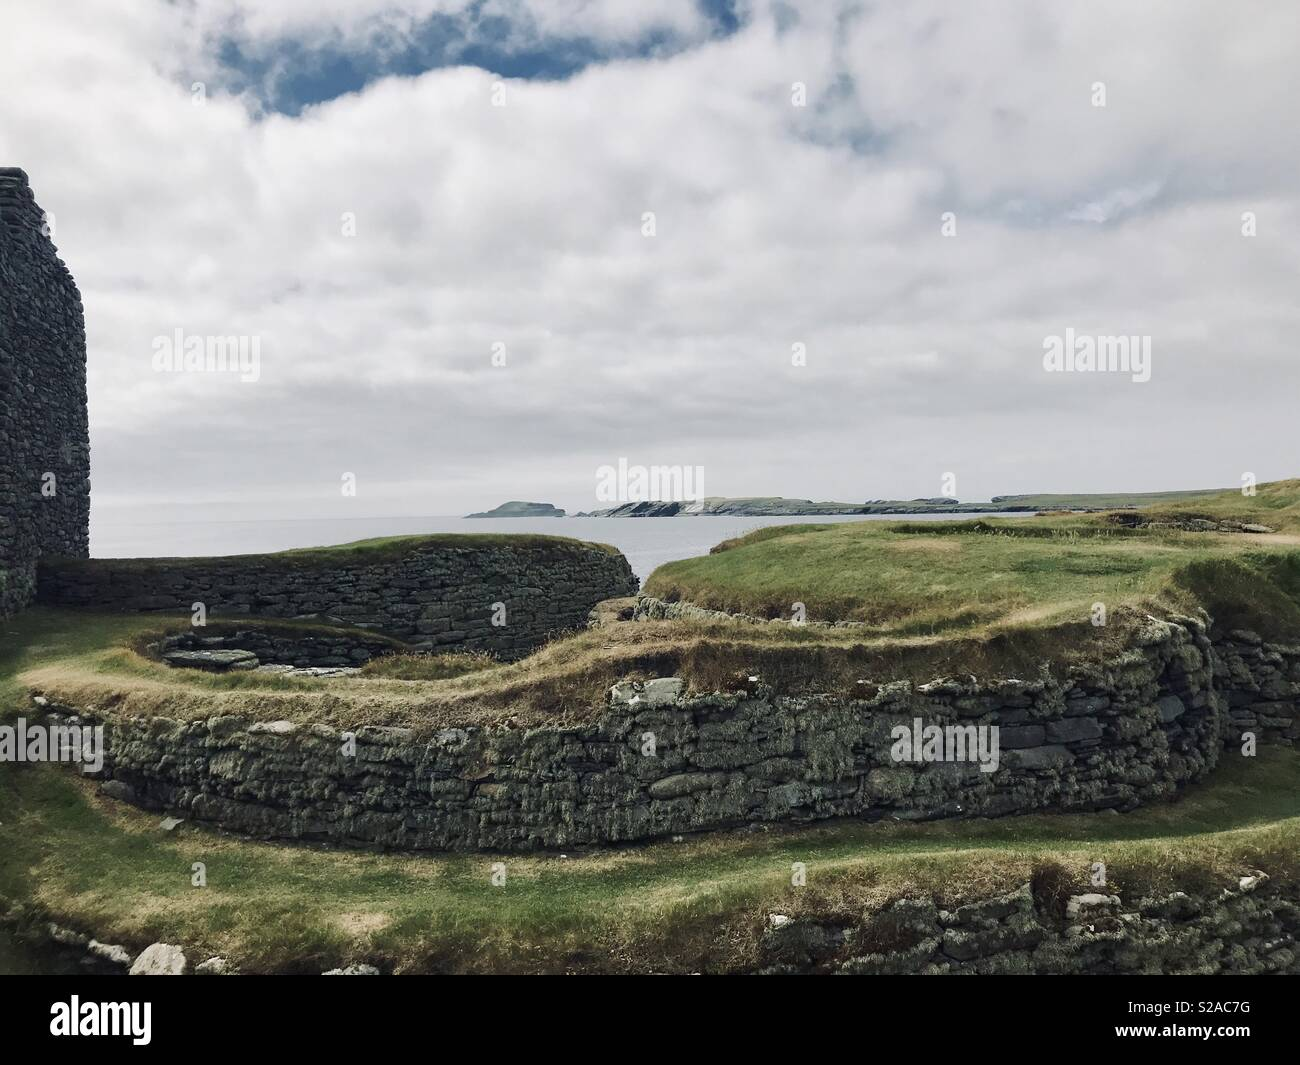 Norse settlement at Jarlshof Scottish archeological site, Shetland Islands - Stock Image